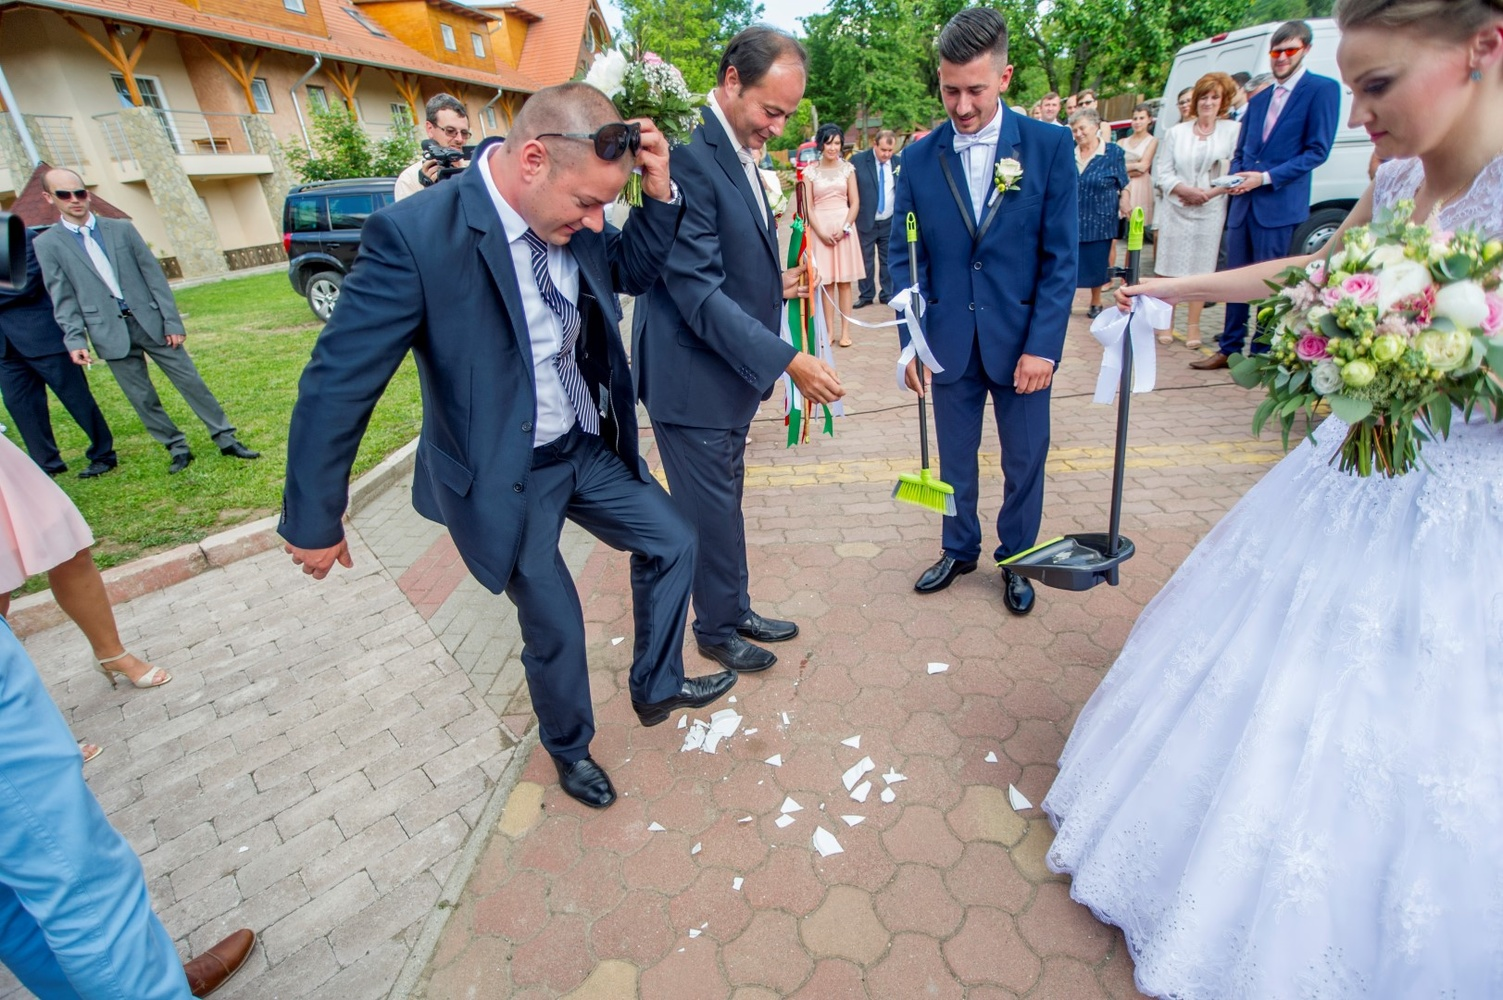 http://www.fotoz.sk/images/gallery-18/normal/eskuvo-fotozas_svadobne-fotenie_509.jpg